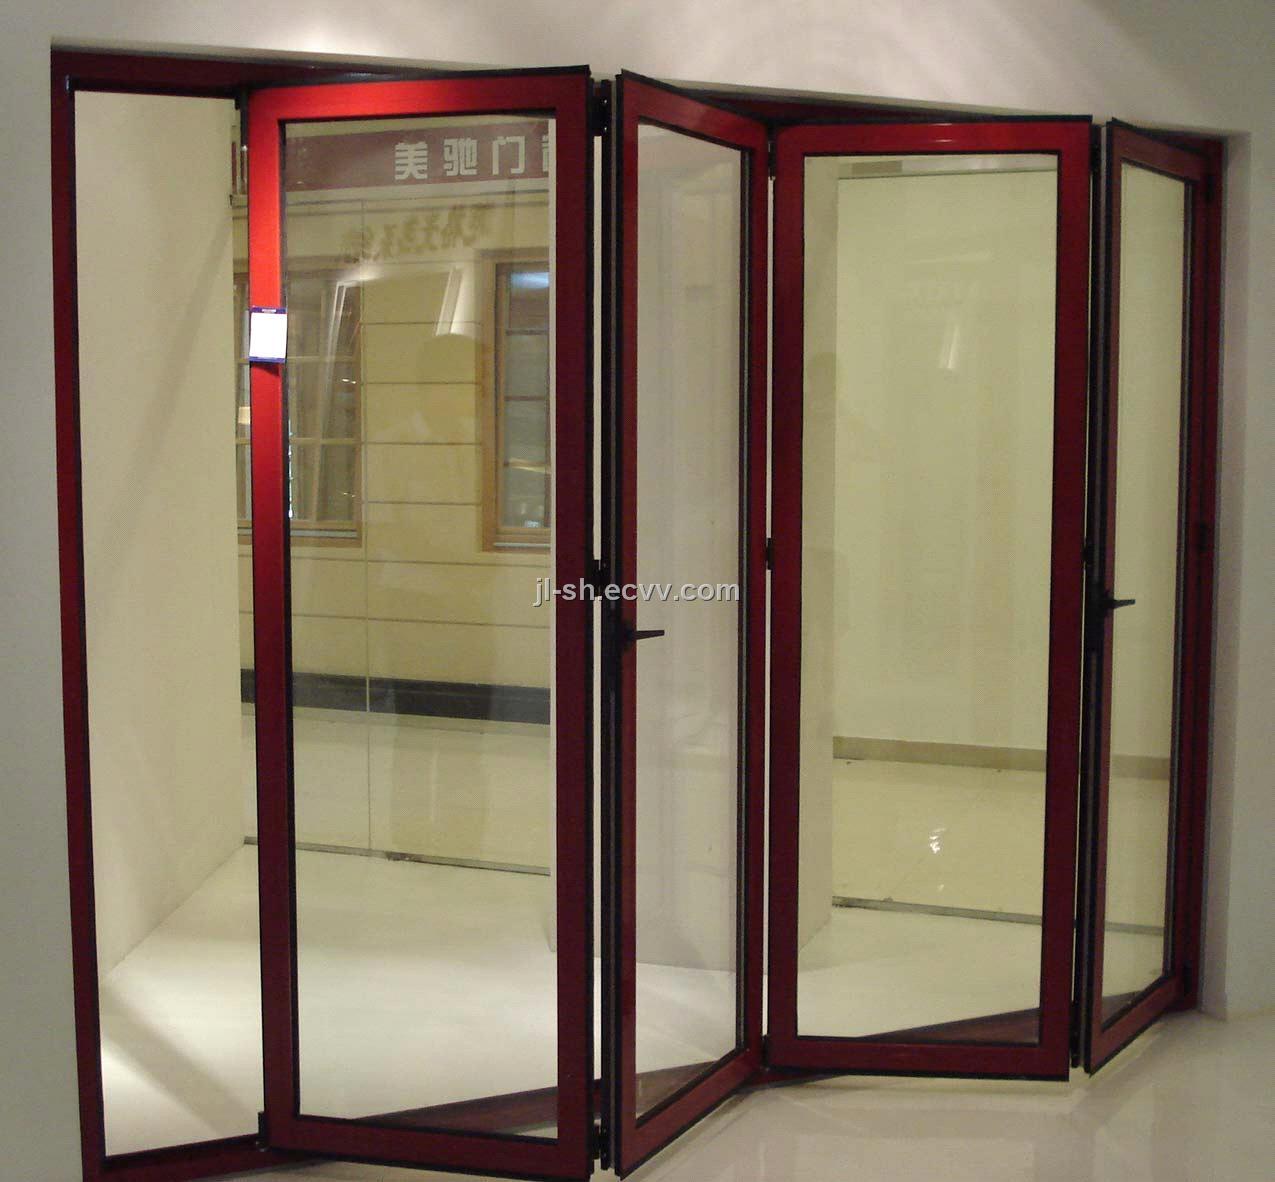 1182 #B42917 Home > Products Catalog > Aluminum Door > Aluminum Folding Door wallpaper Aluminum Entry Doors 39551275